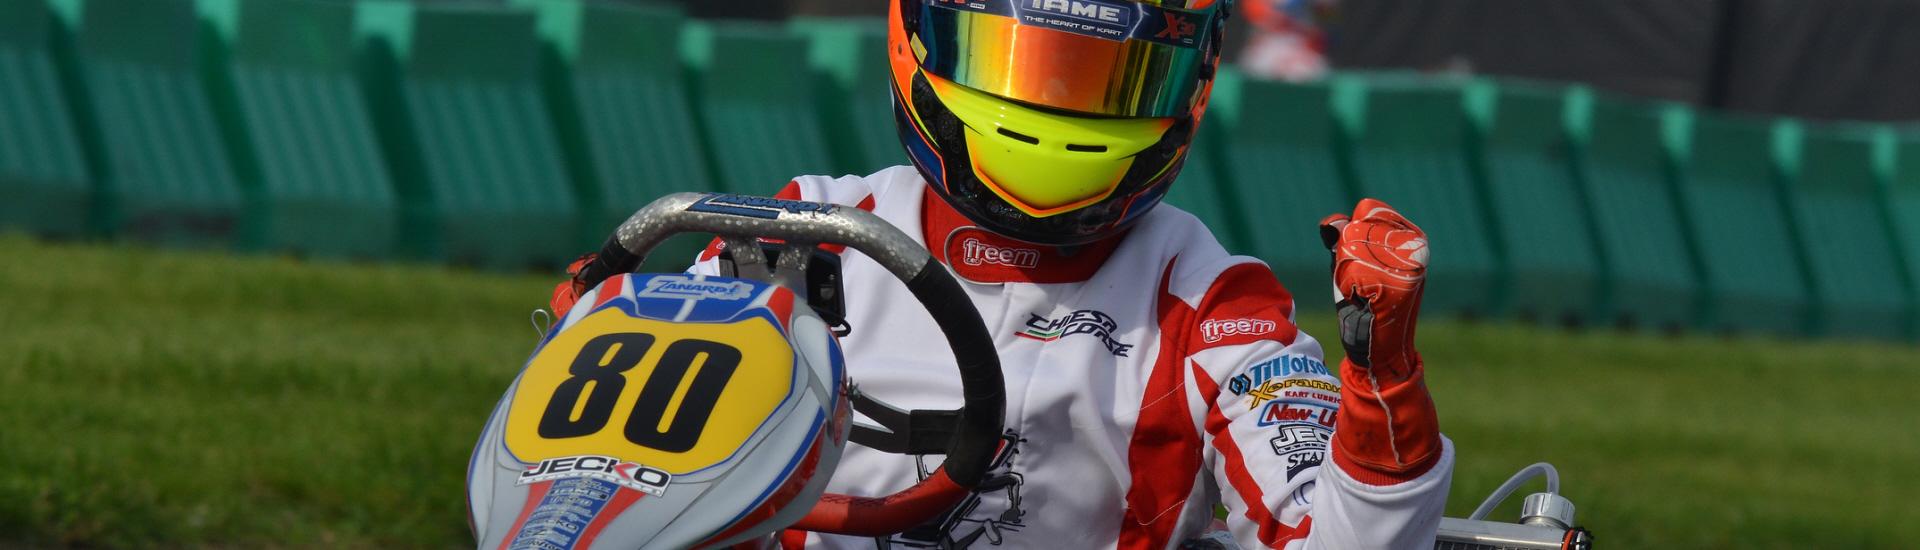 lap records tvkc pfi karting circuit lincolnshire